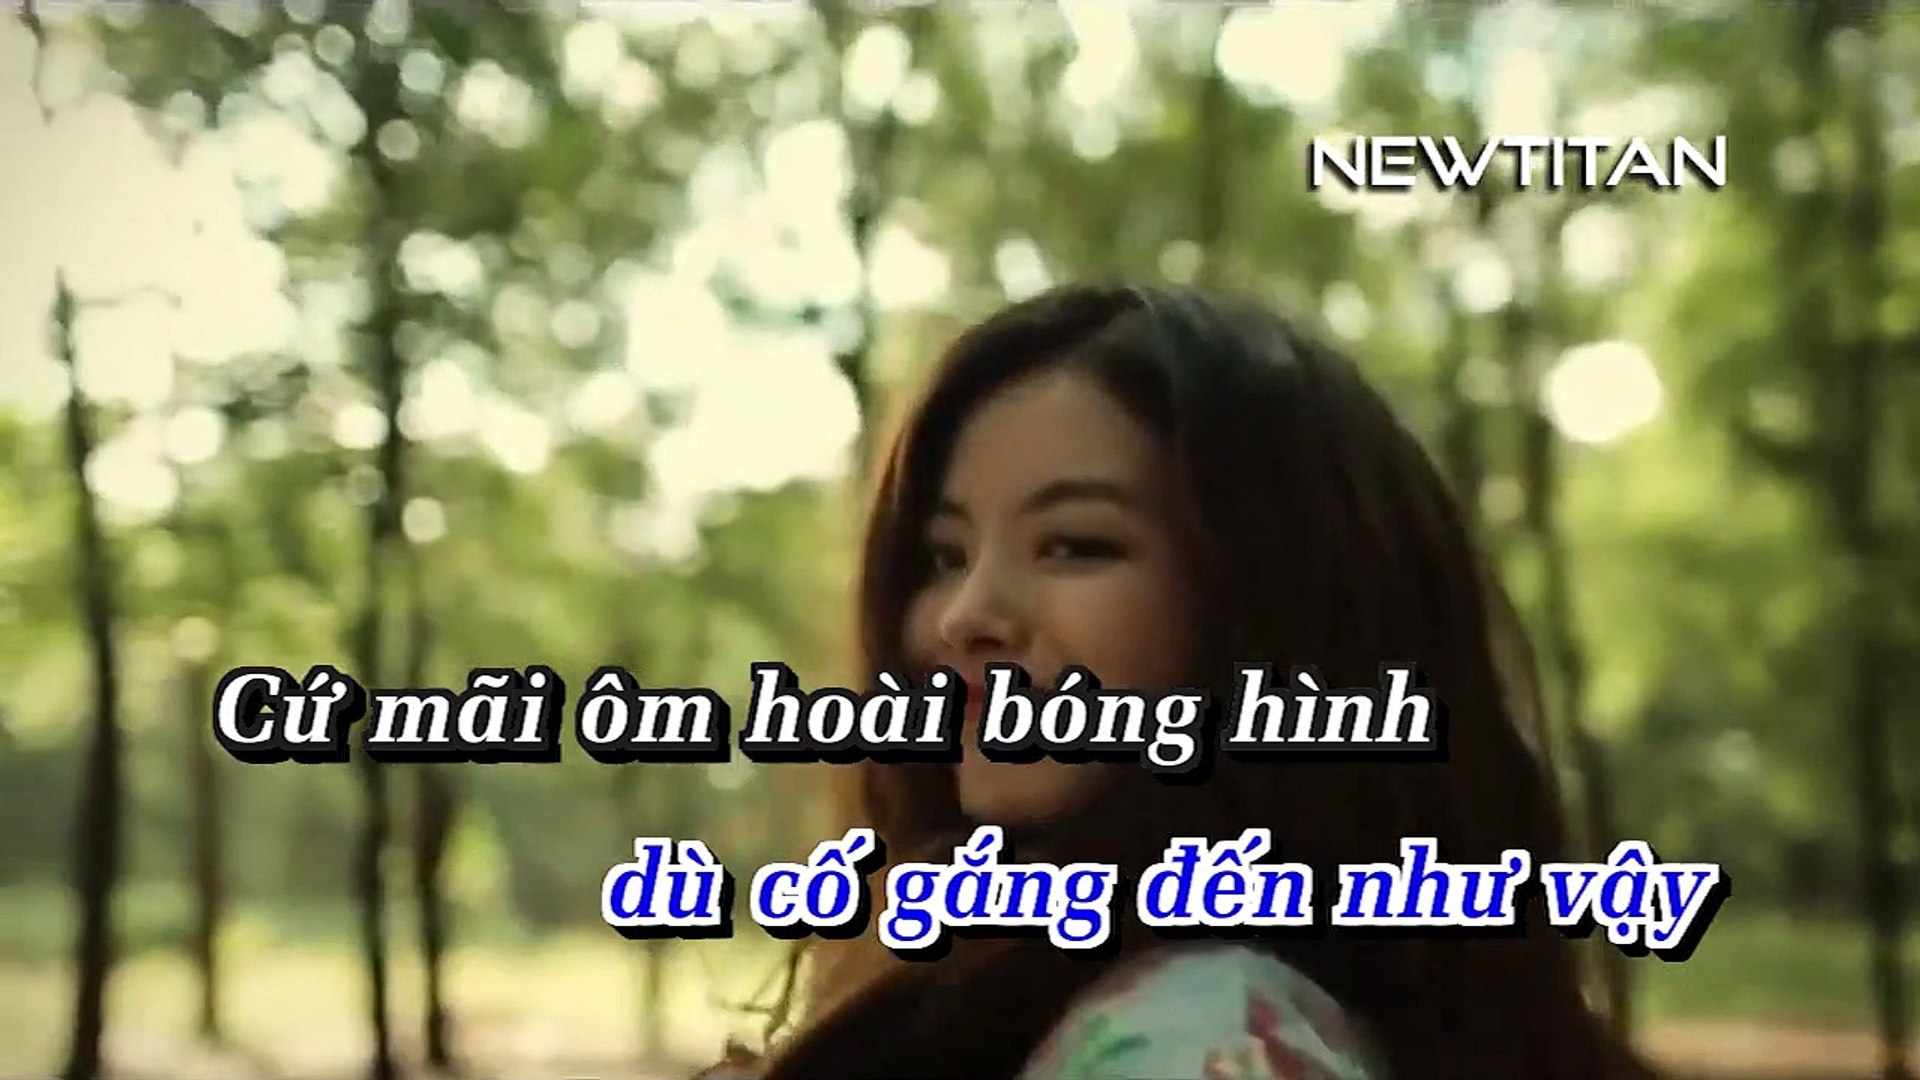 [Karaoke] Yêu Sau Lưng Em - Vương Anh Tú [Beat]